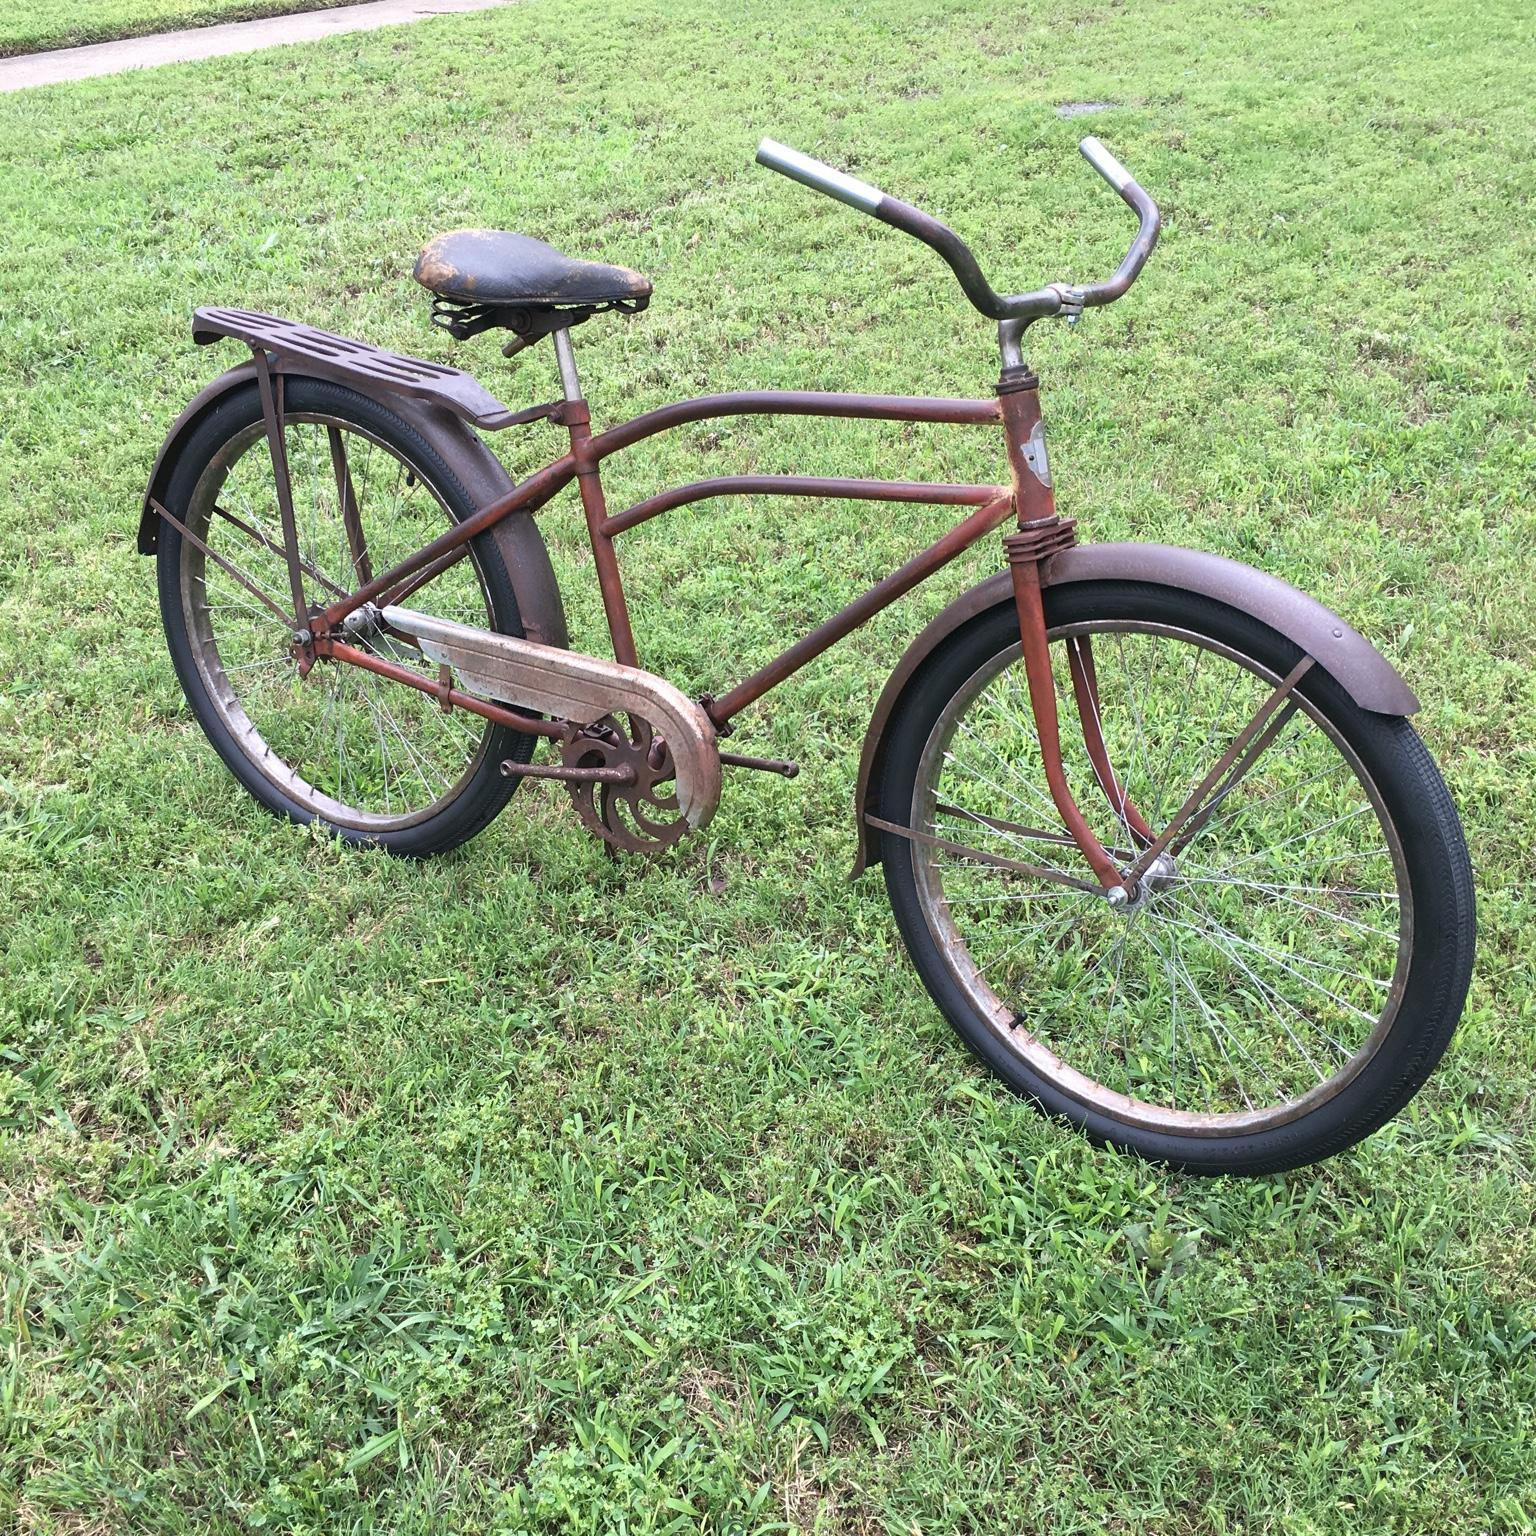 montgomery ward bicycle serial numbers